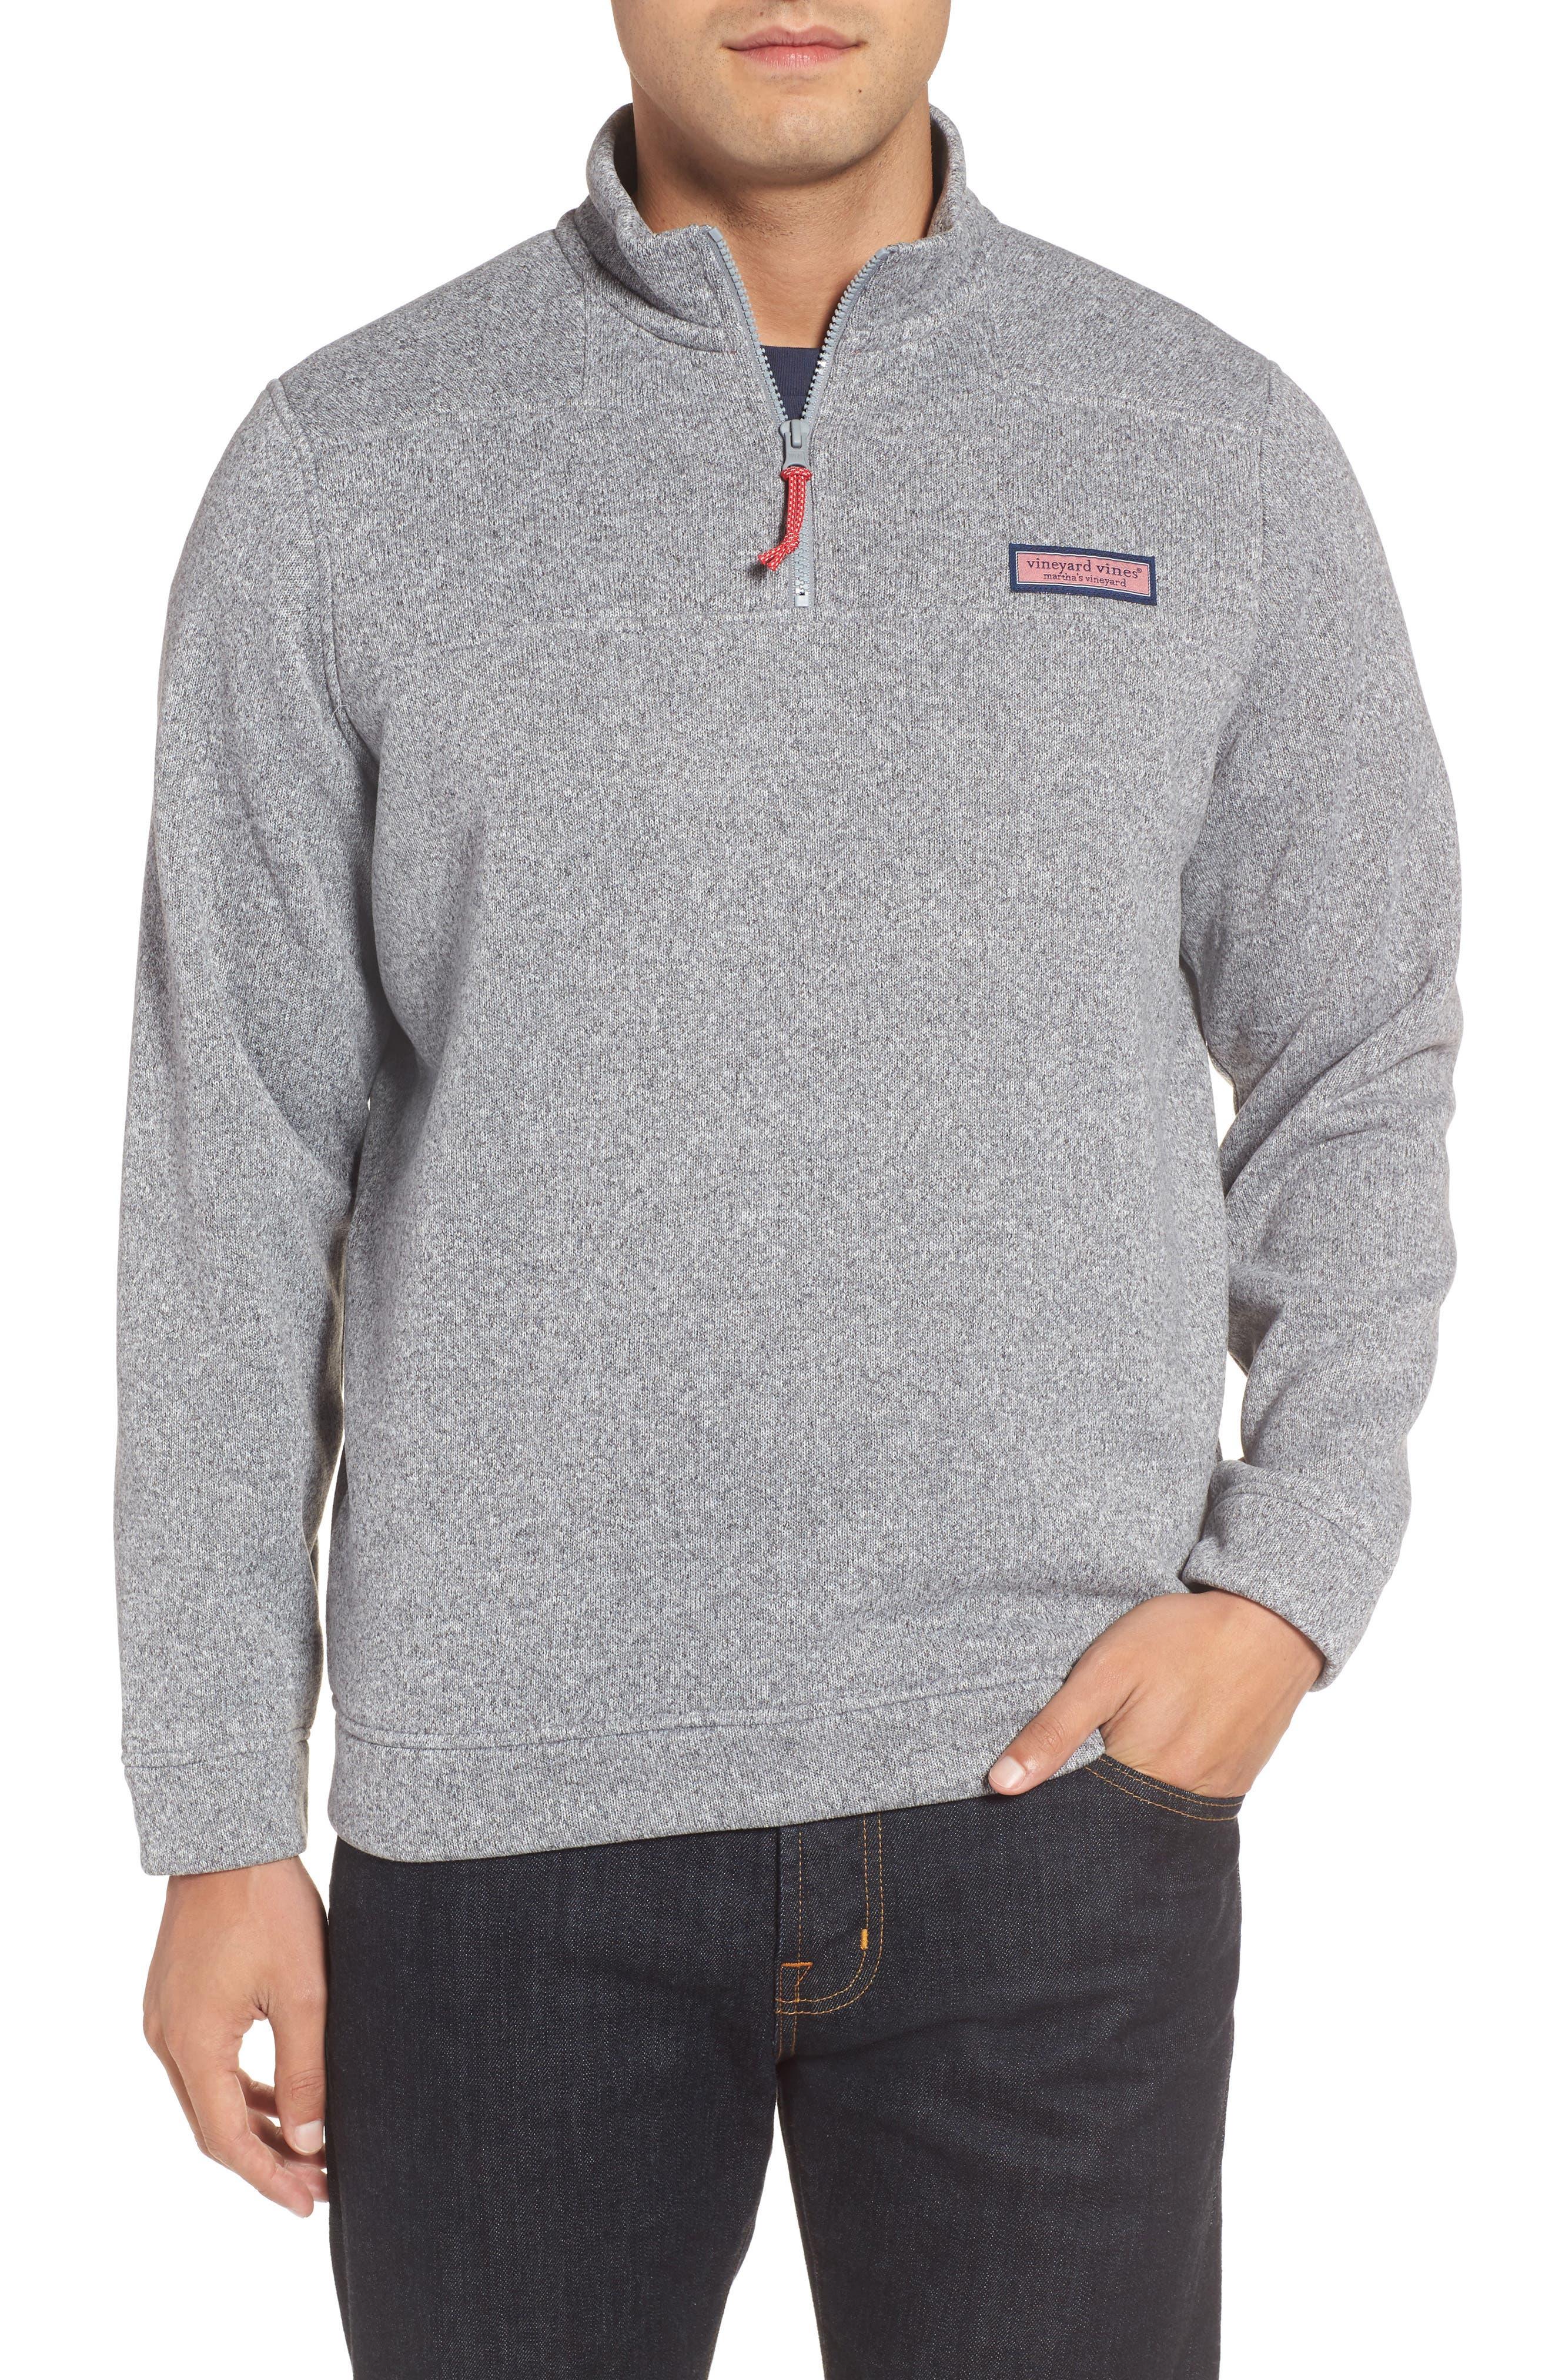 Shep Sweater Fleece Quarter Zip Pullover,                         Main,                         color, Minnow Grey